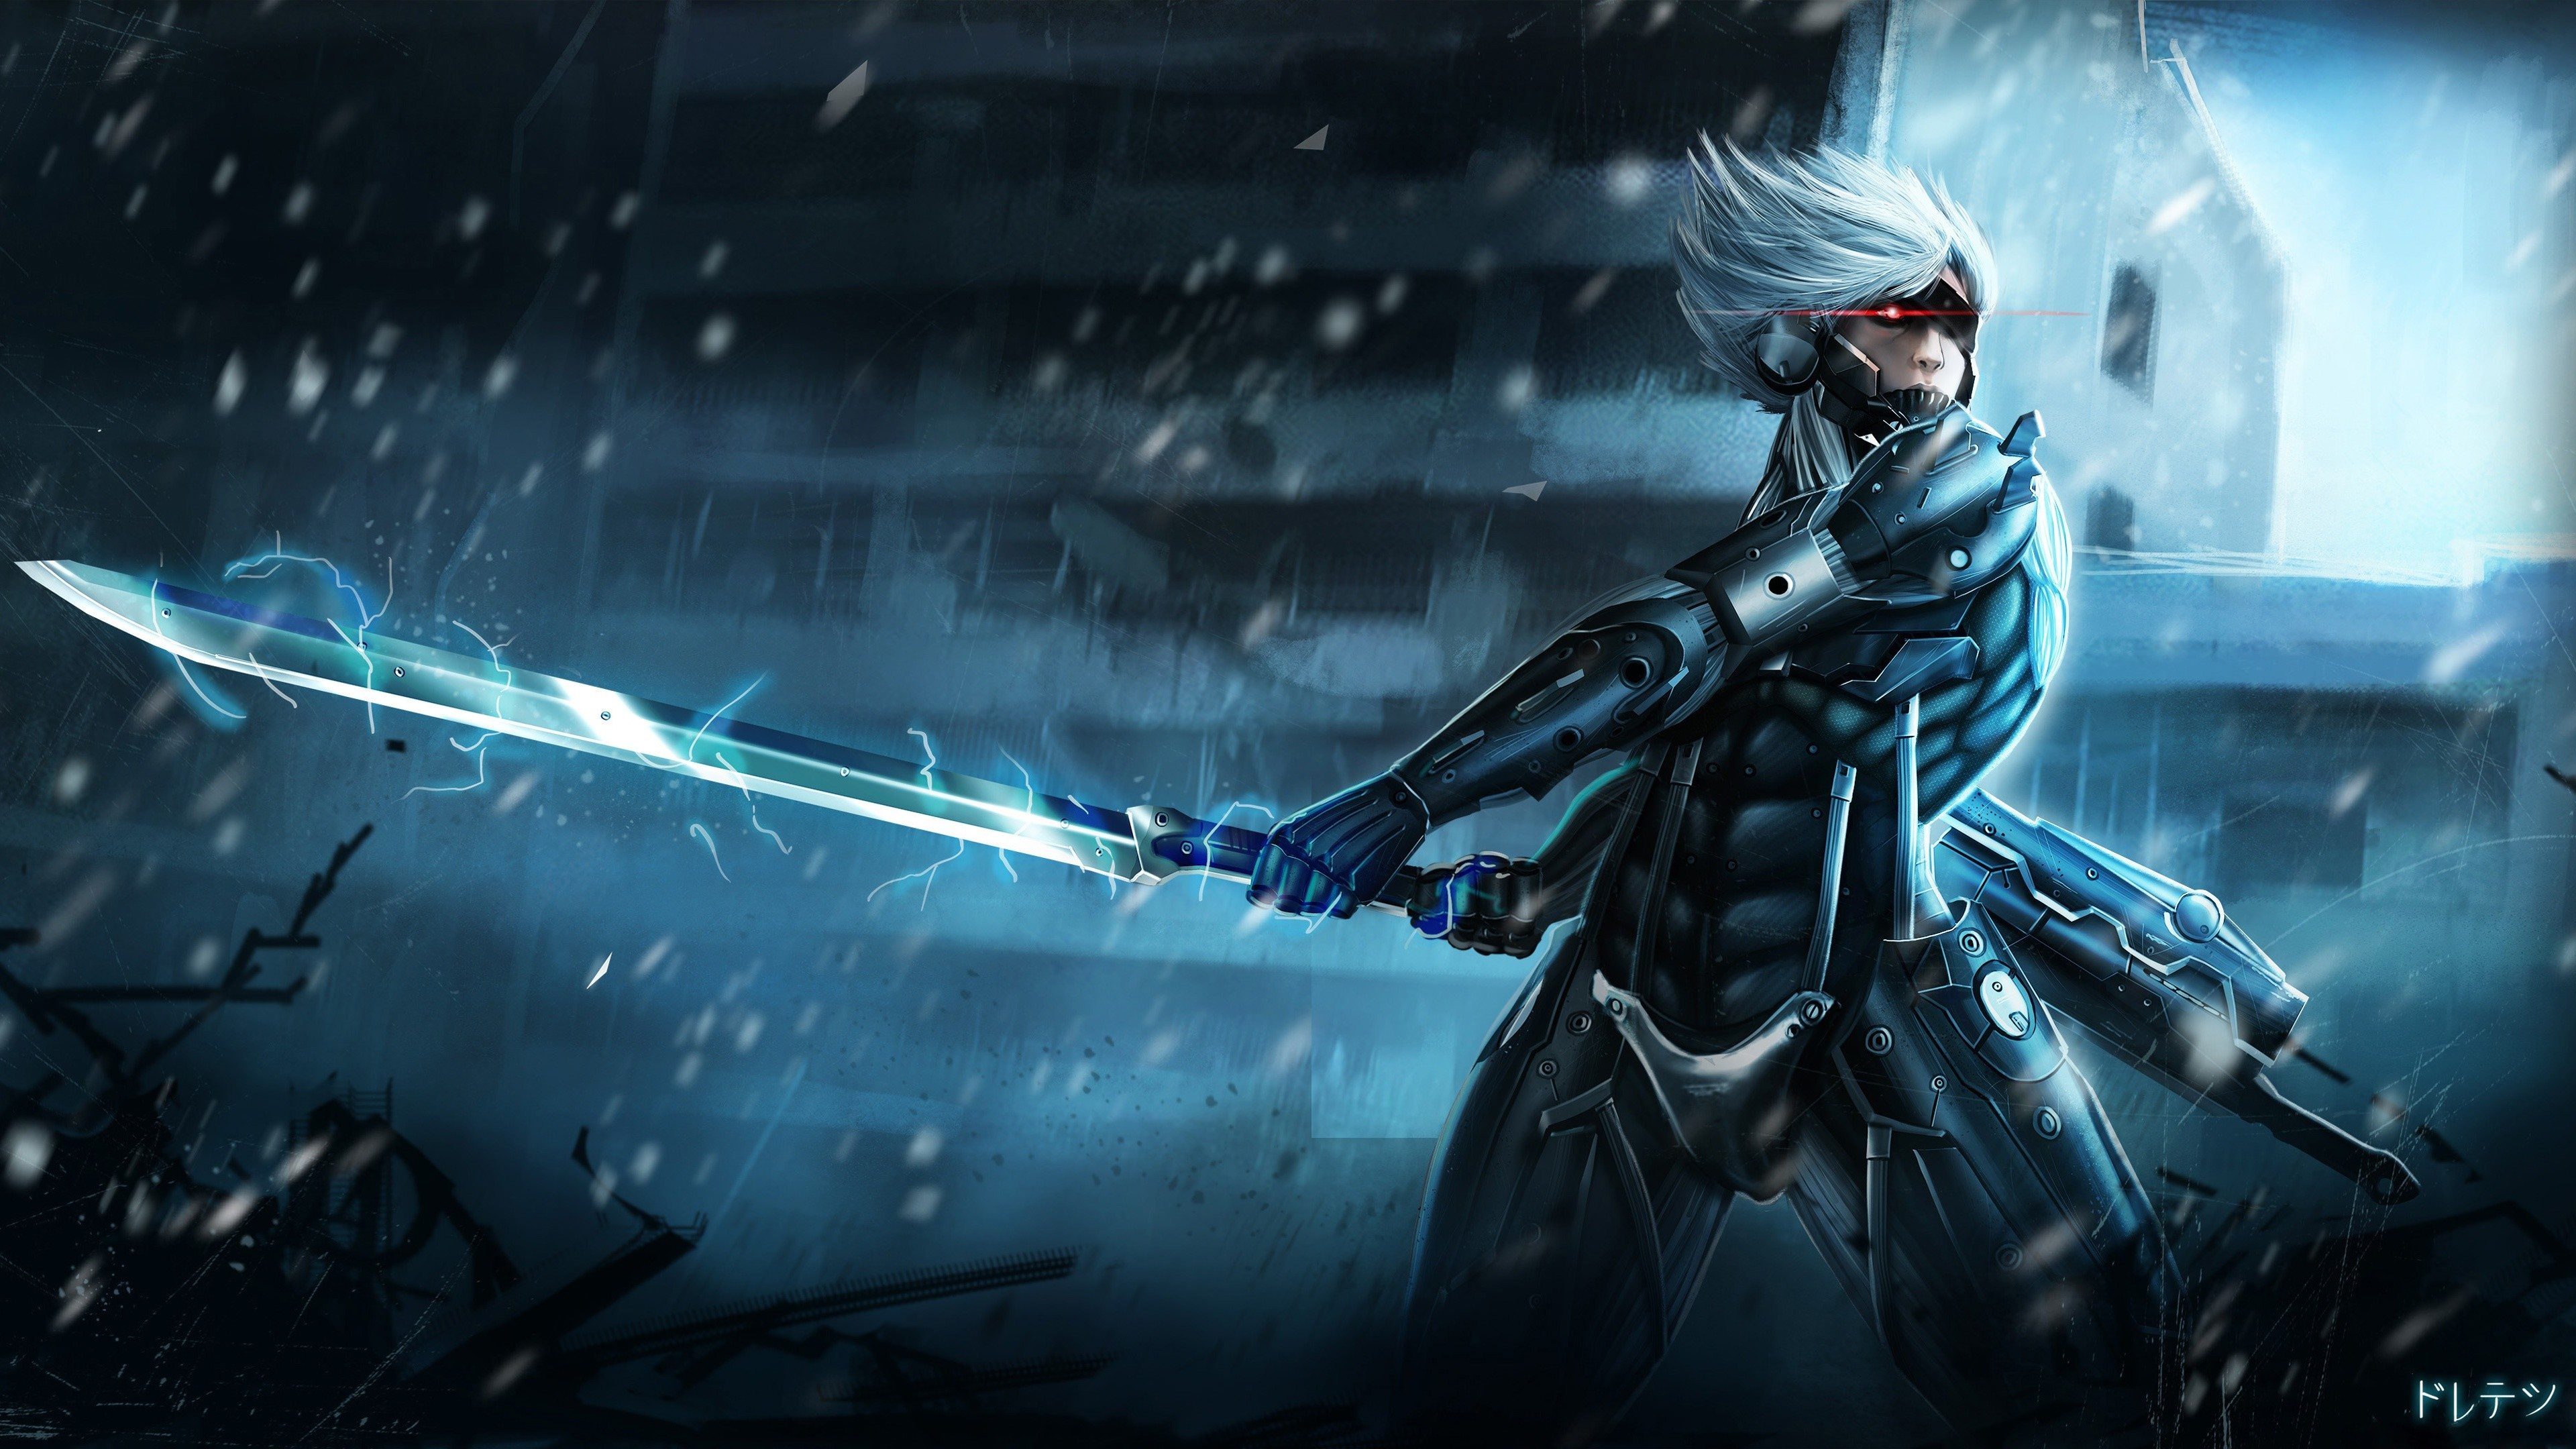 52 Metal Gear Rising: Revengeance HD Wallpapers   Backgrounds